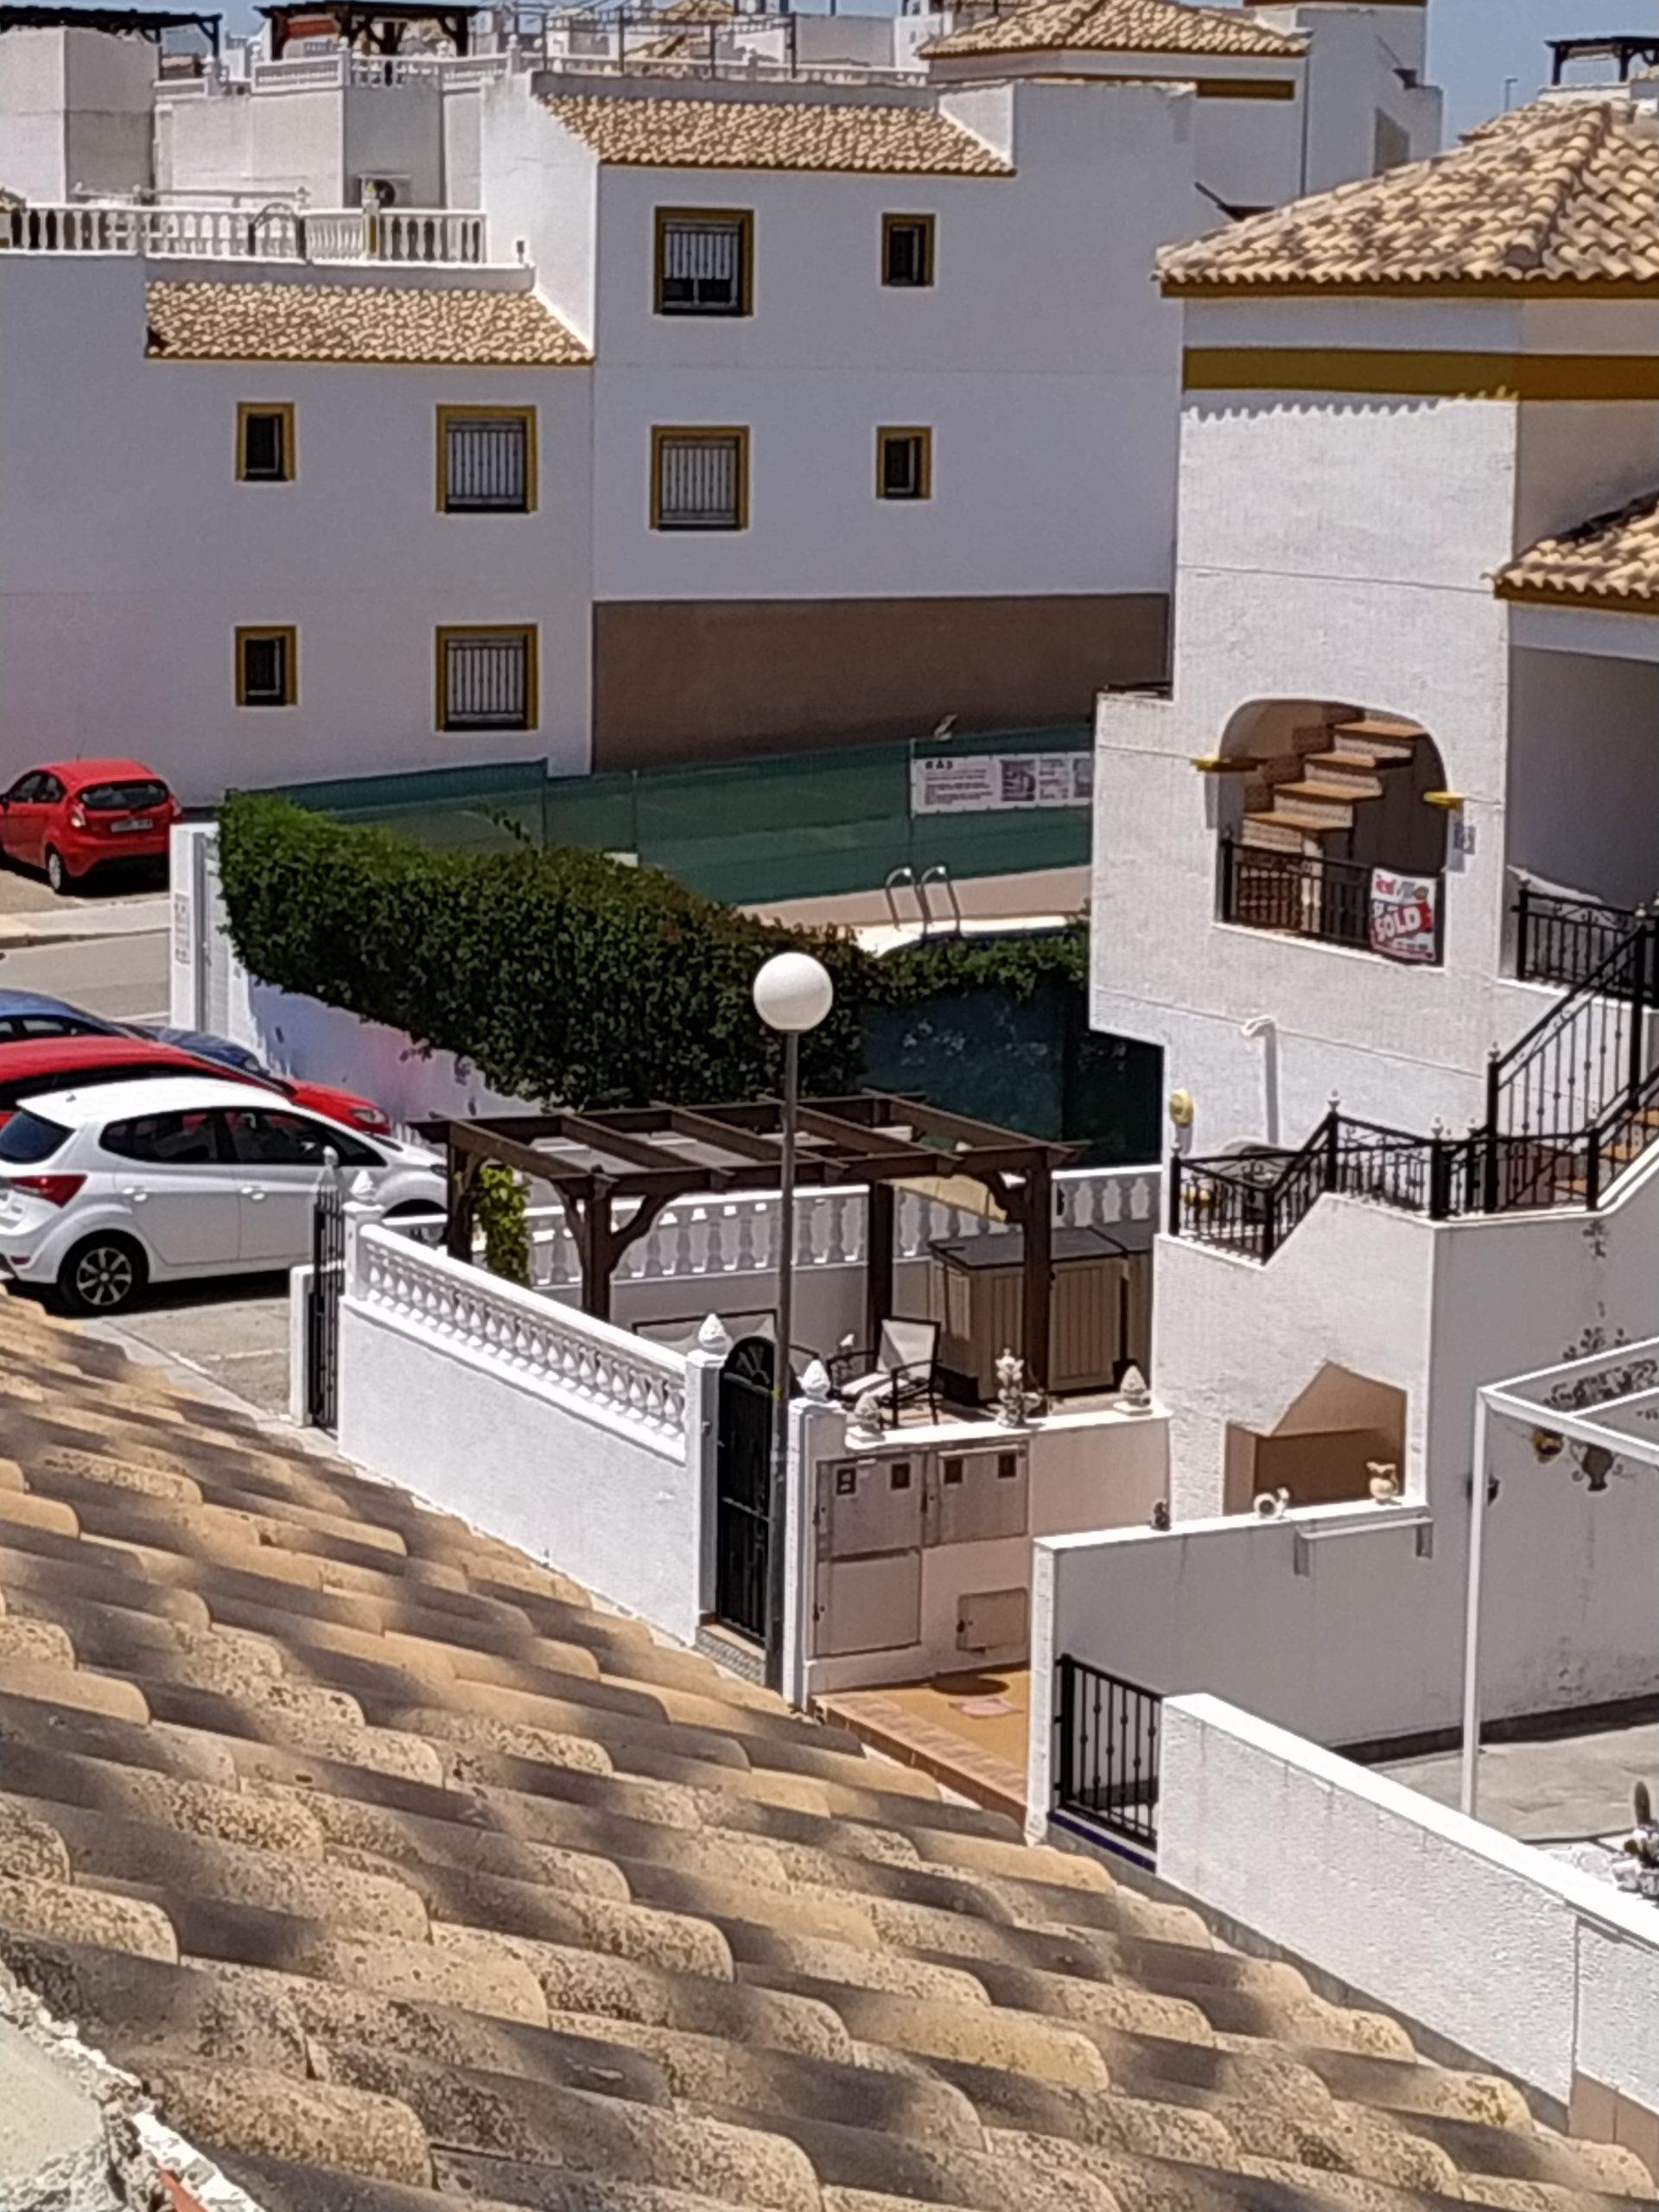 Excellent corner apartment with superb views